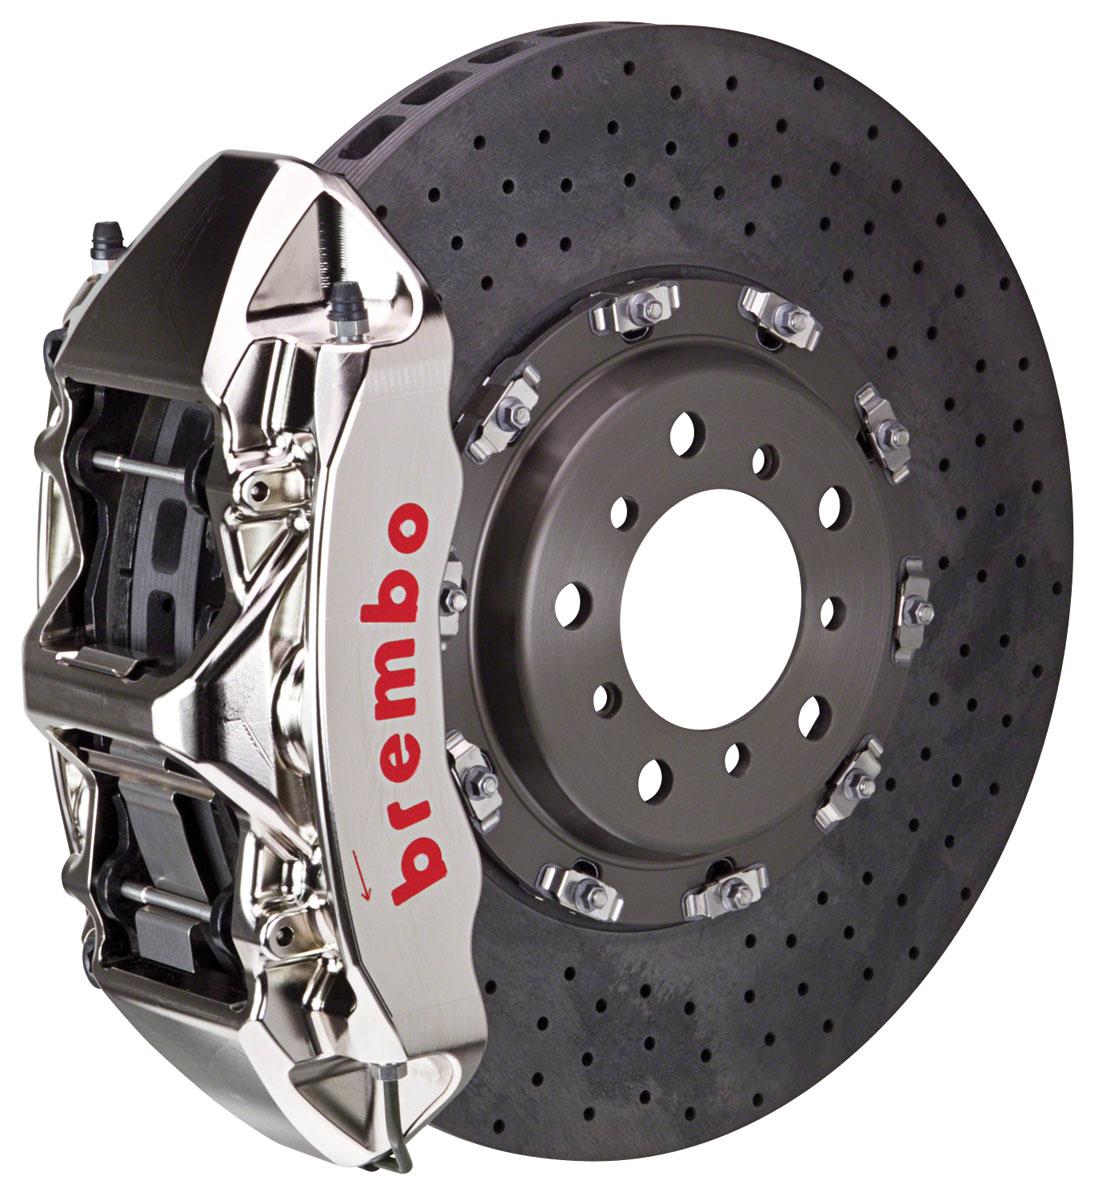 Brake Set, Brembo GT-R, 09-15 CTS-V, Front, CCM-R 2pc 380 Rotor, 1pc 6P Caliper